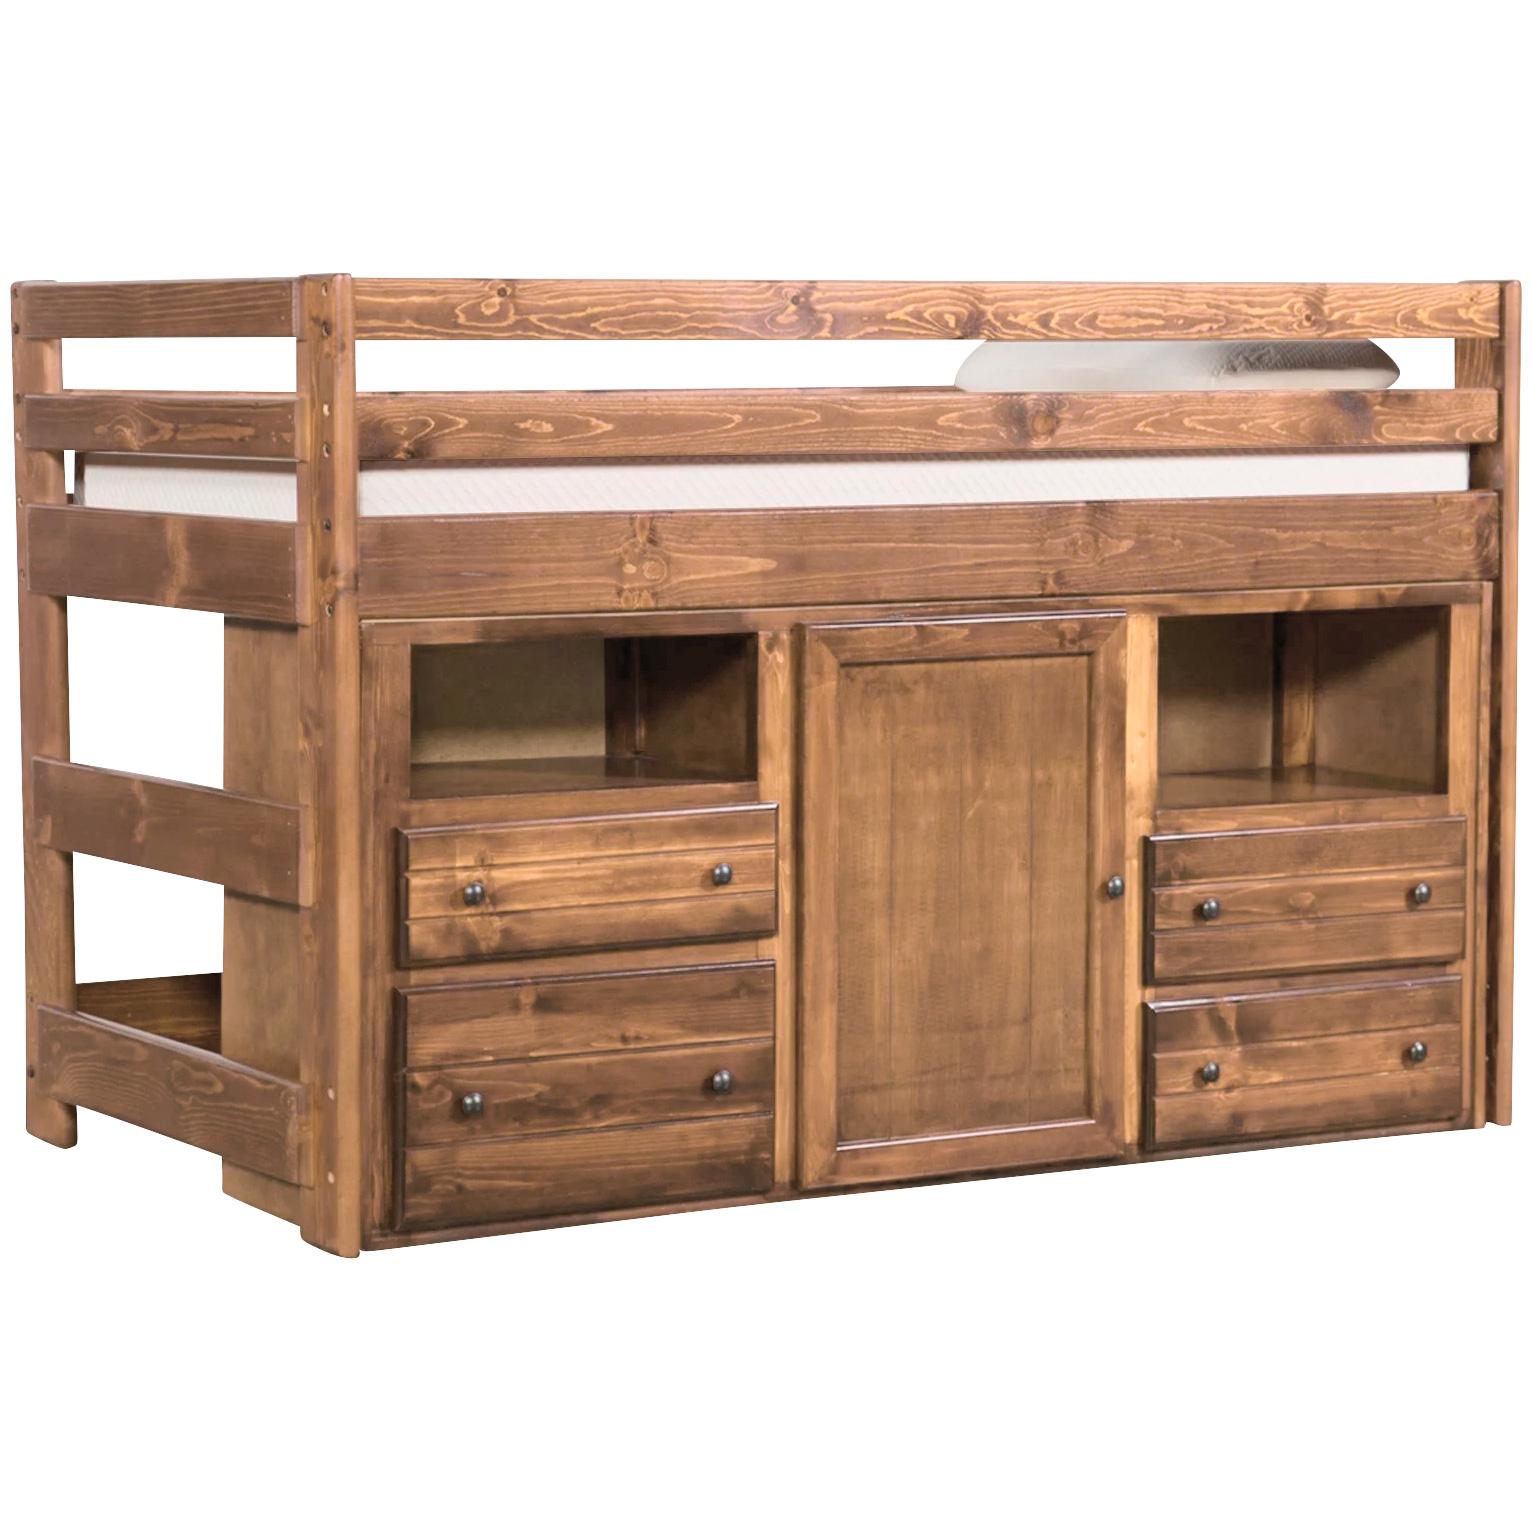 Trendwood Inc. | Bayview Buckskin Loft Bed with Super Dresser